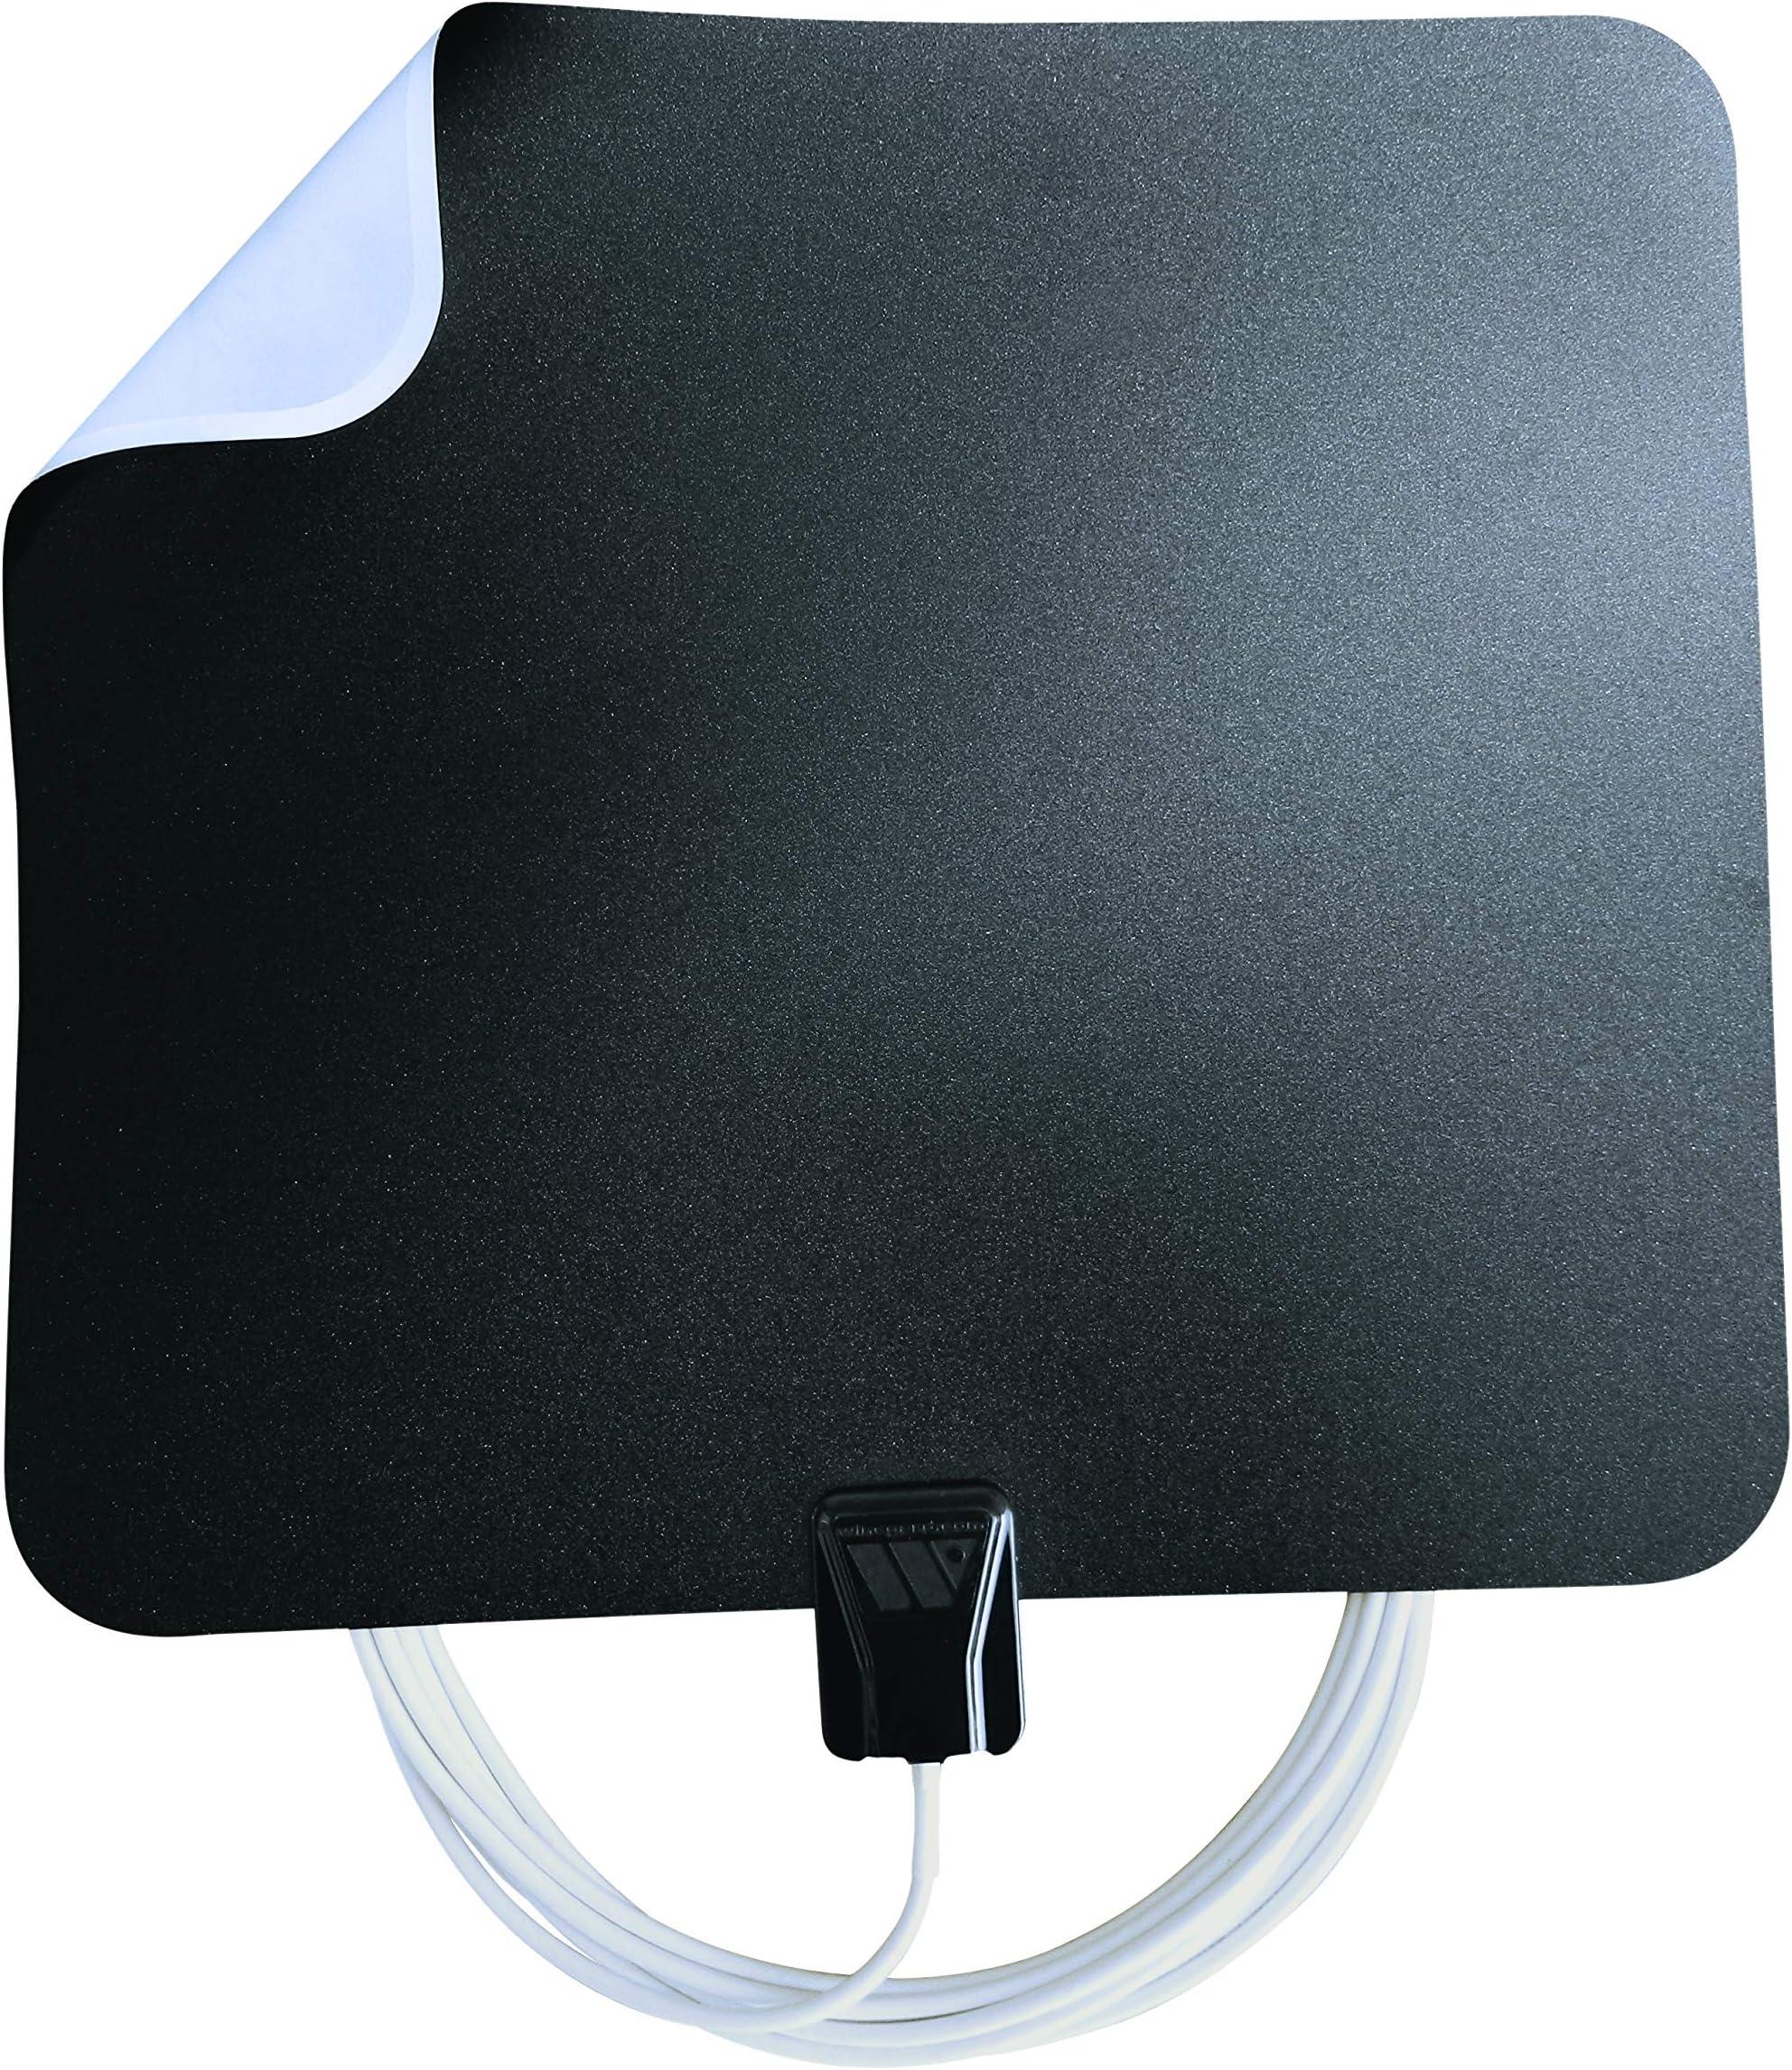 Winegard FL5500A FlatWave Amped Digital HD Indoor Amplified TV Antenna (4K Ready / ATSC 3.0 Ready / High-VHF / UHF), 60 Mile Long Range